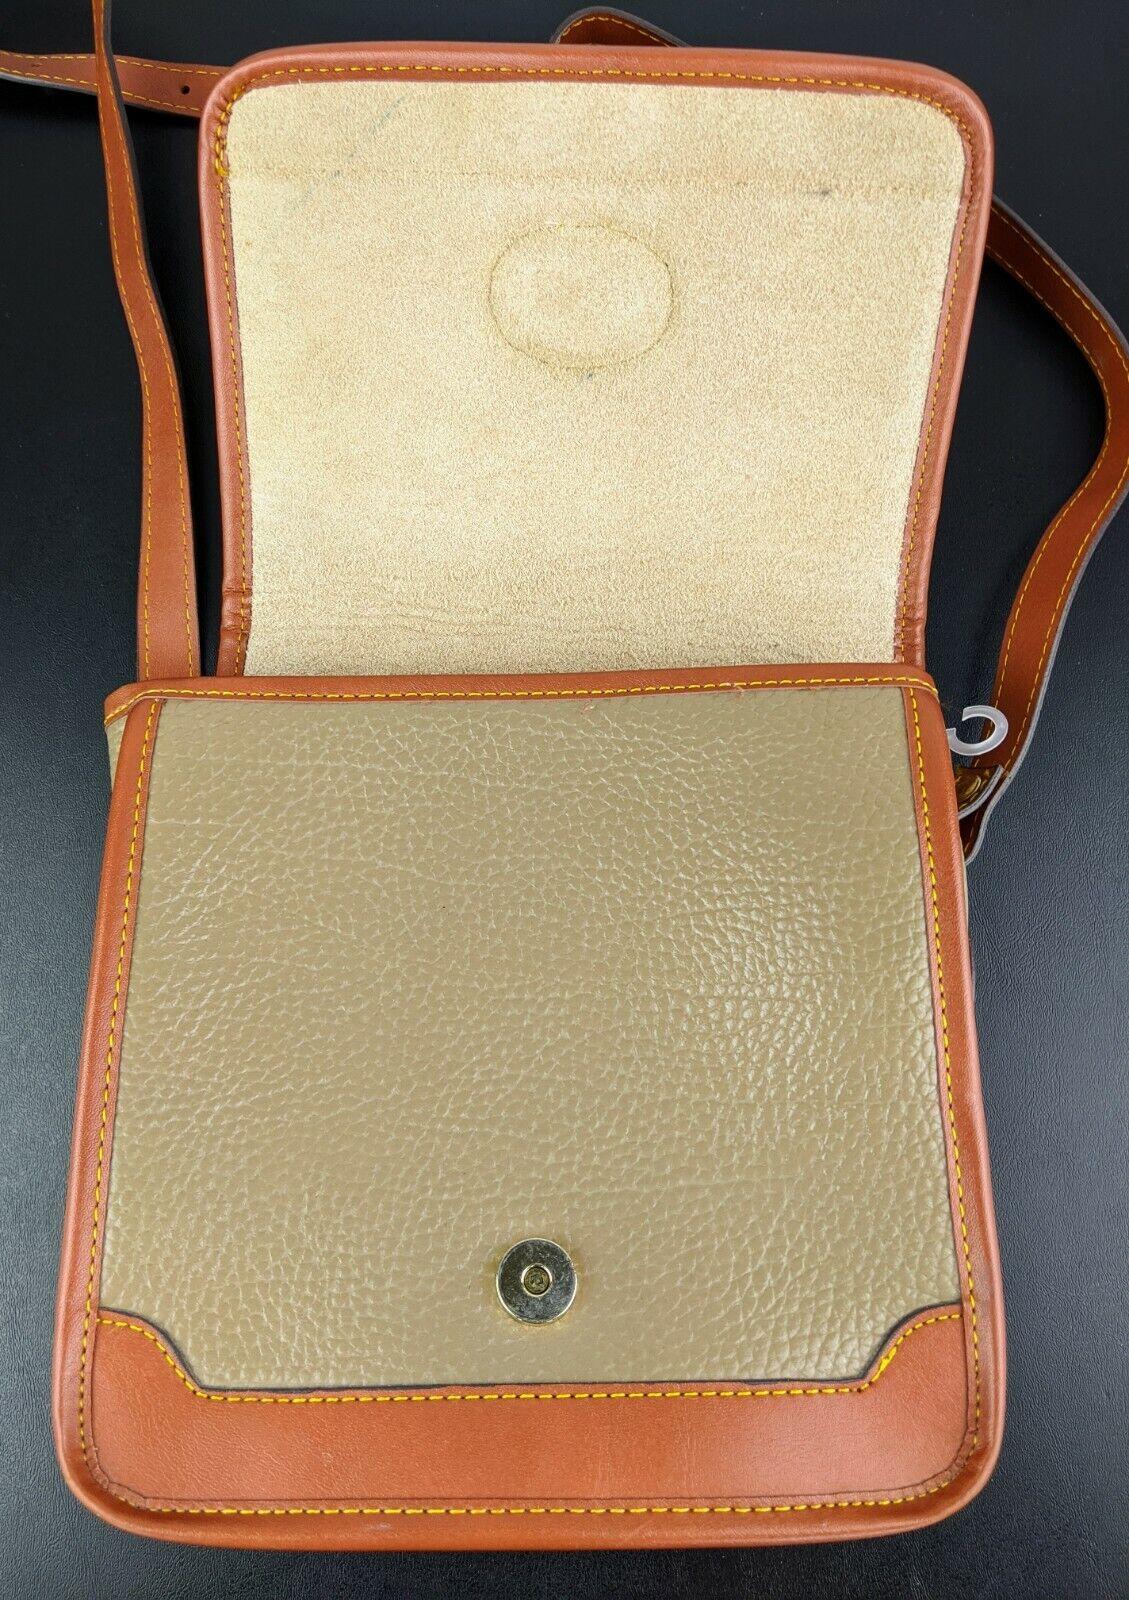 Dooney & Bourke Tan Brown Small Purse Handbag Tra… - image 5